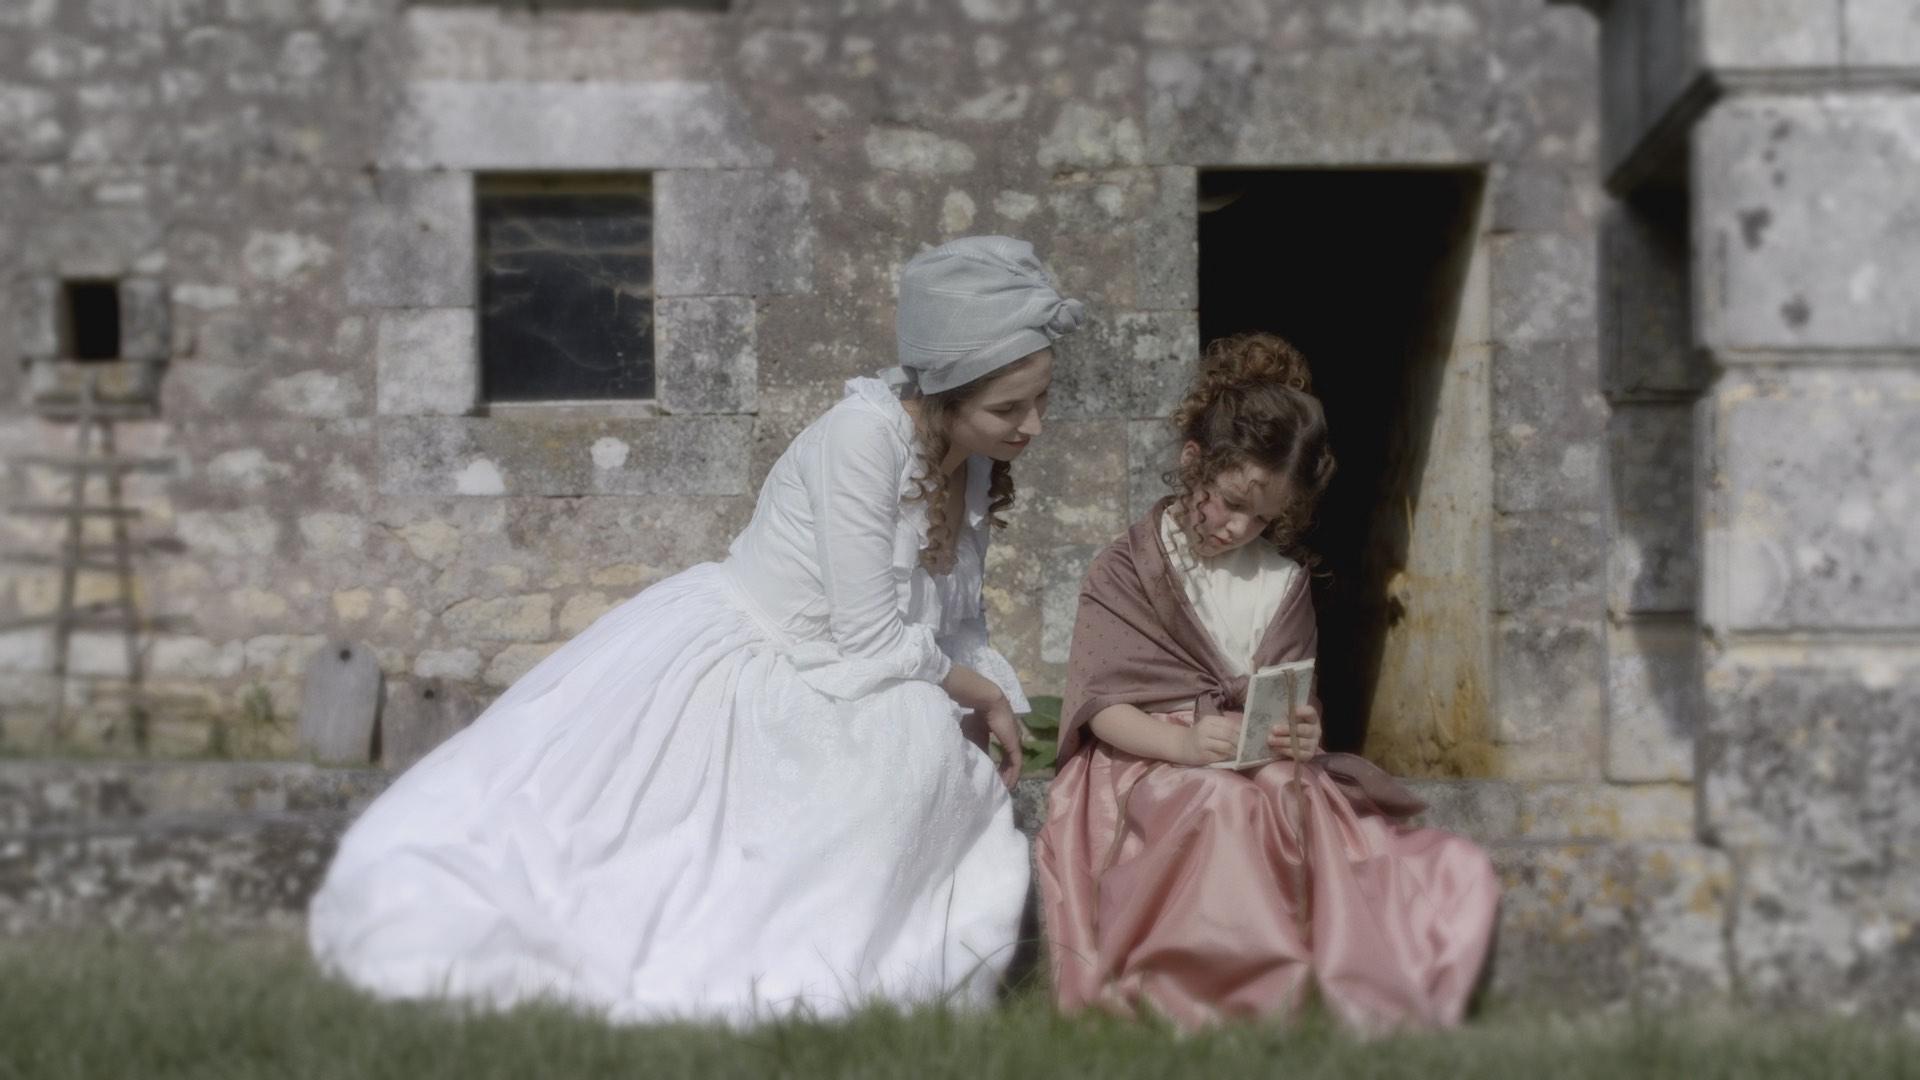 The fabulous destiny of Louise Elizabeth Vigée-Lebrun